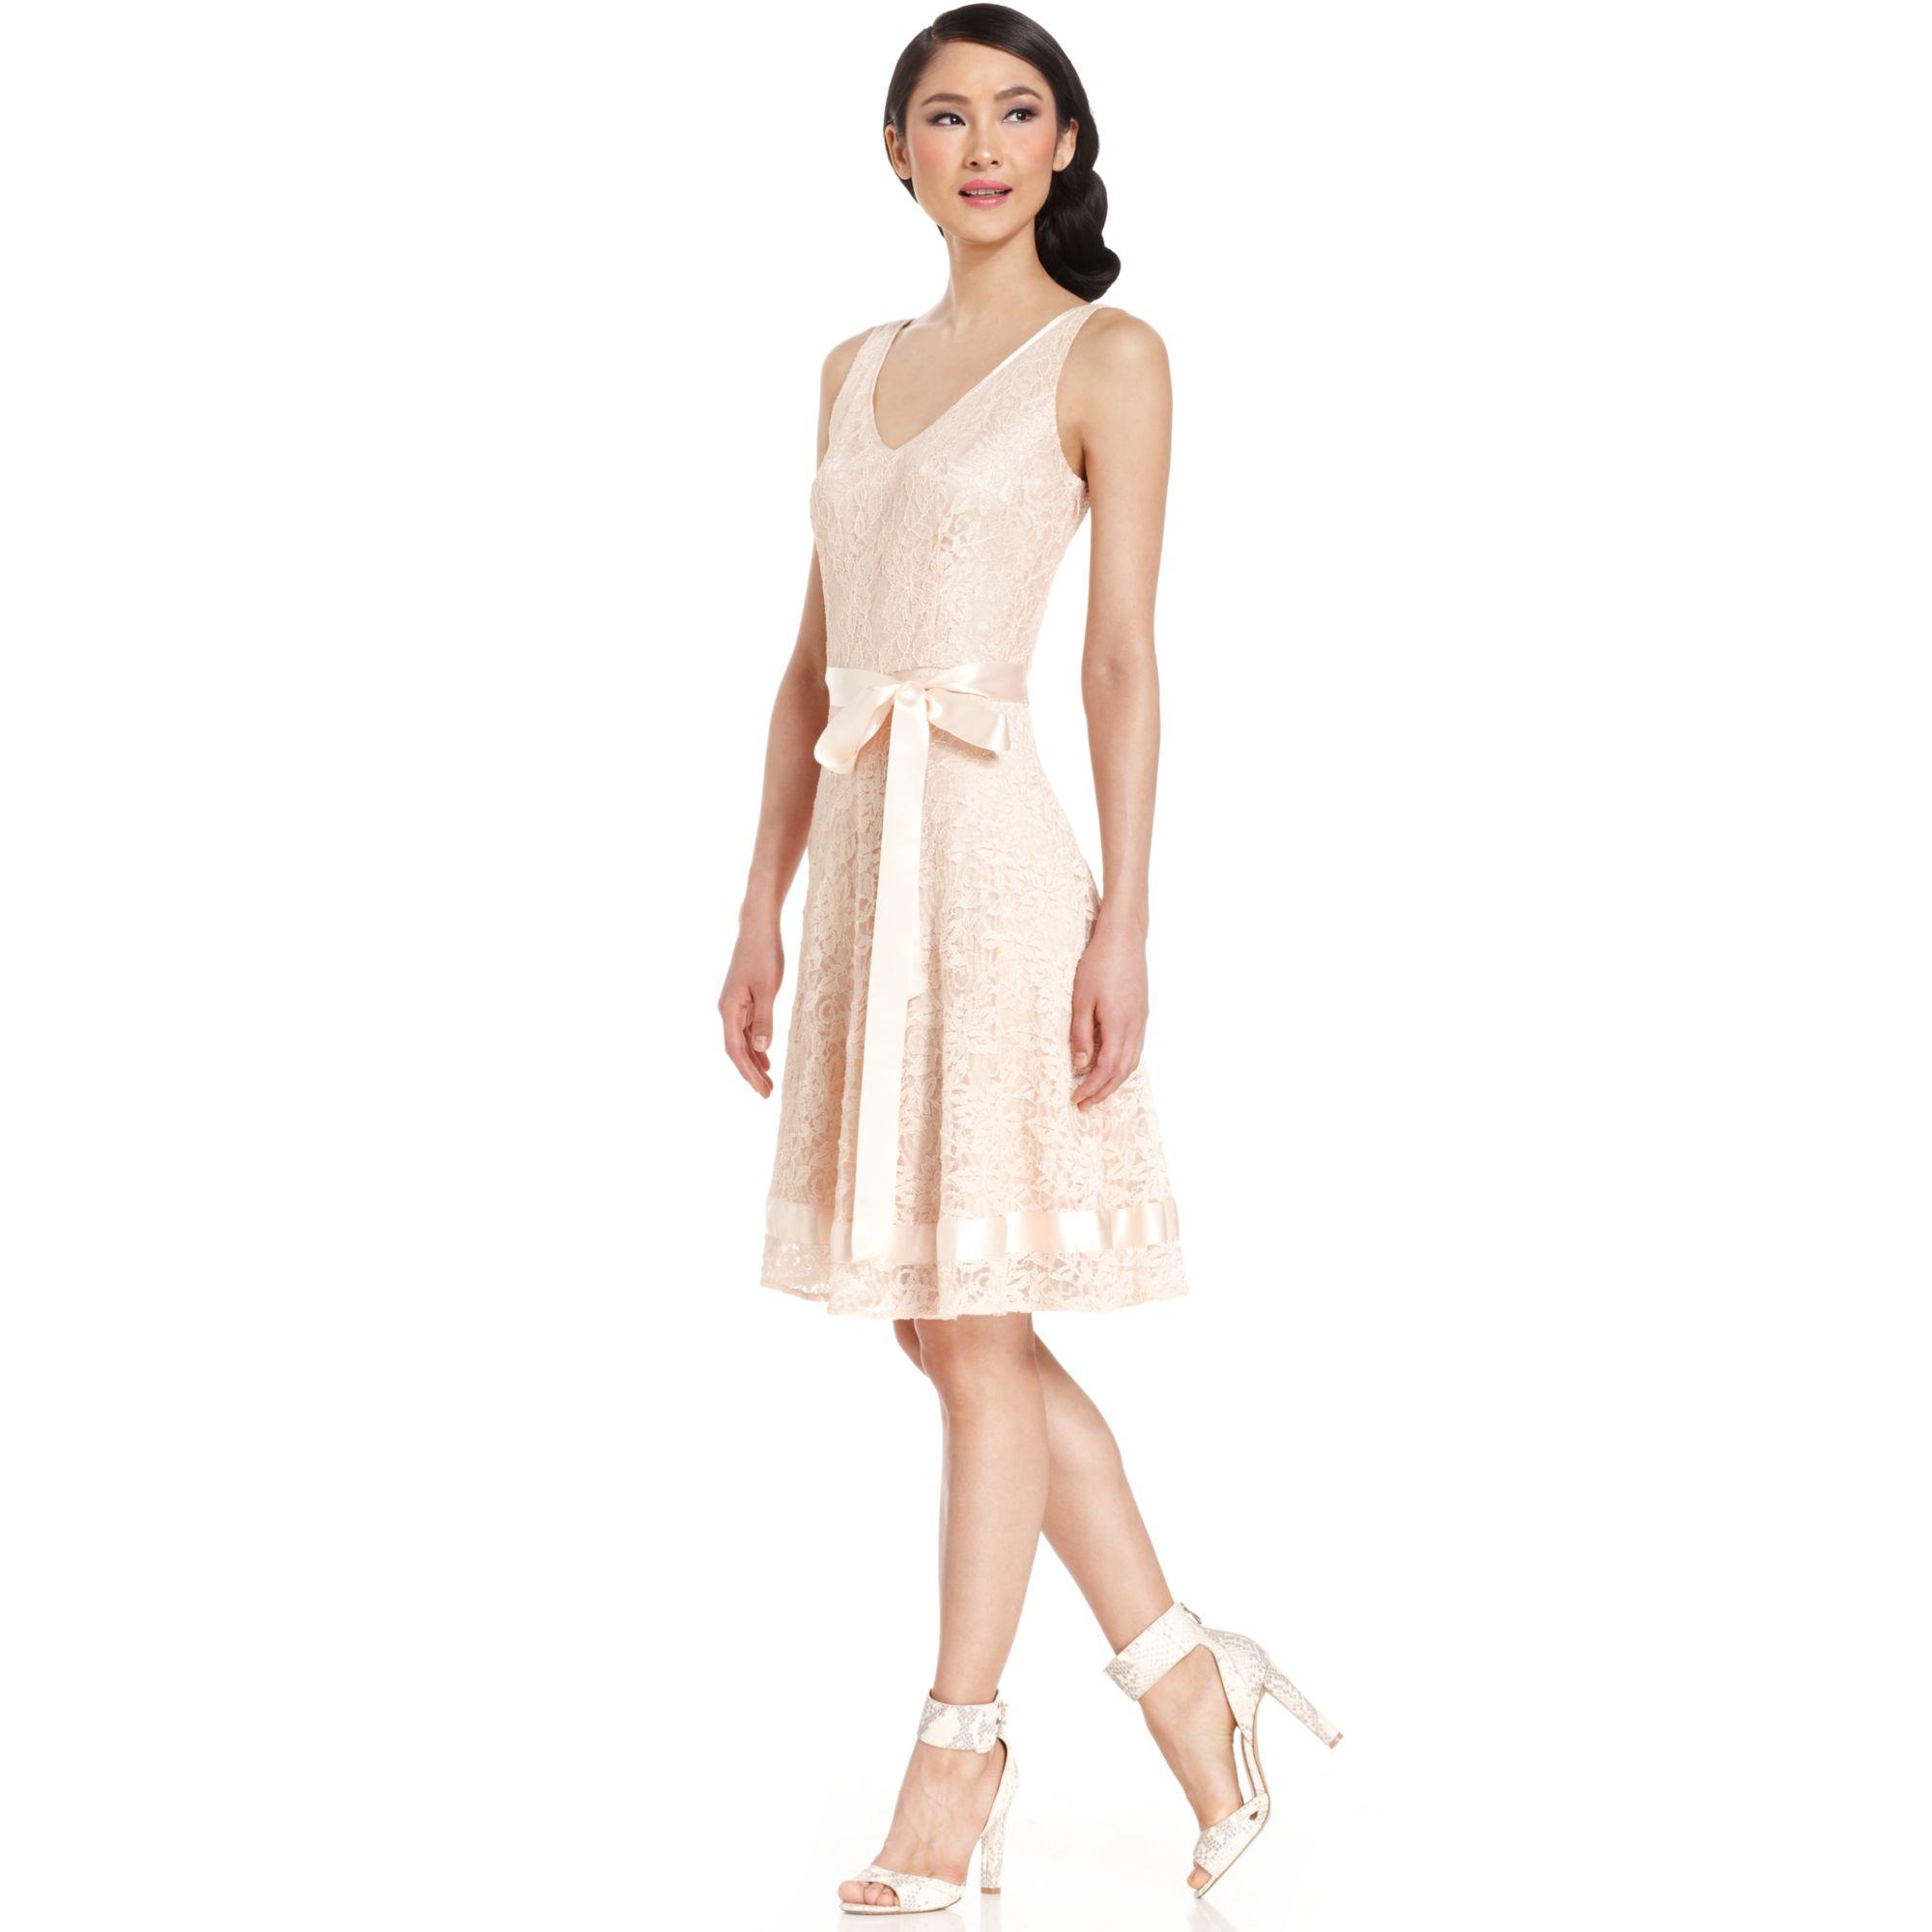 Tahari By Asl Sleeveless Lace Ribbontrim Dress In Beige